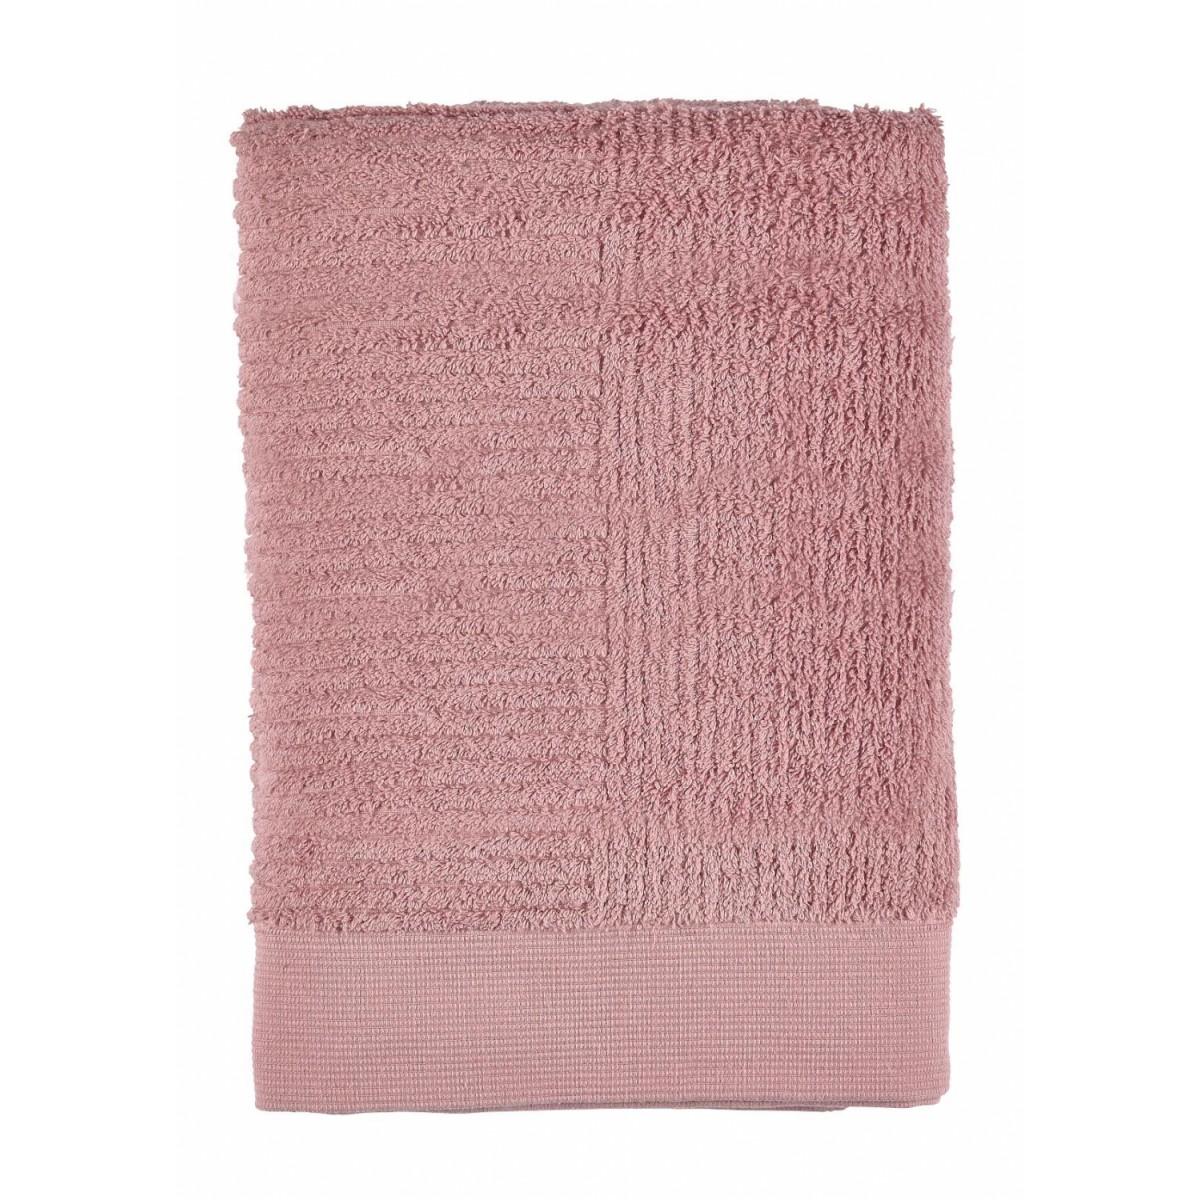 ZONE Classic håndklæde 70 x 140 cm. rosa